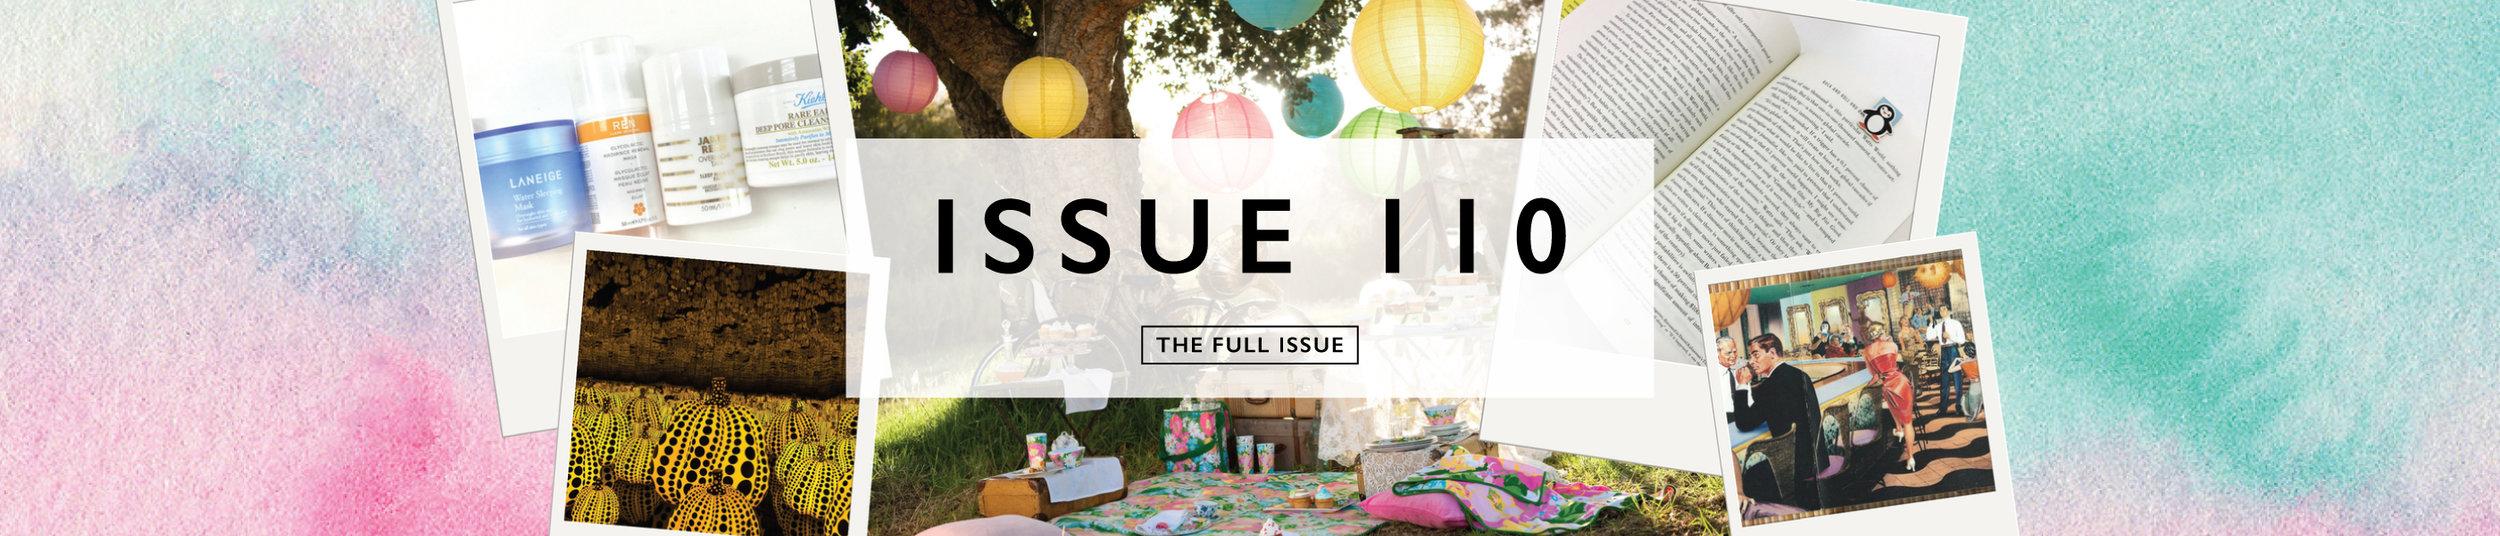 issue110.jpeg